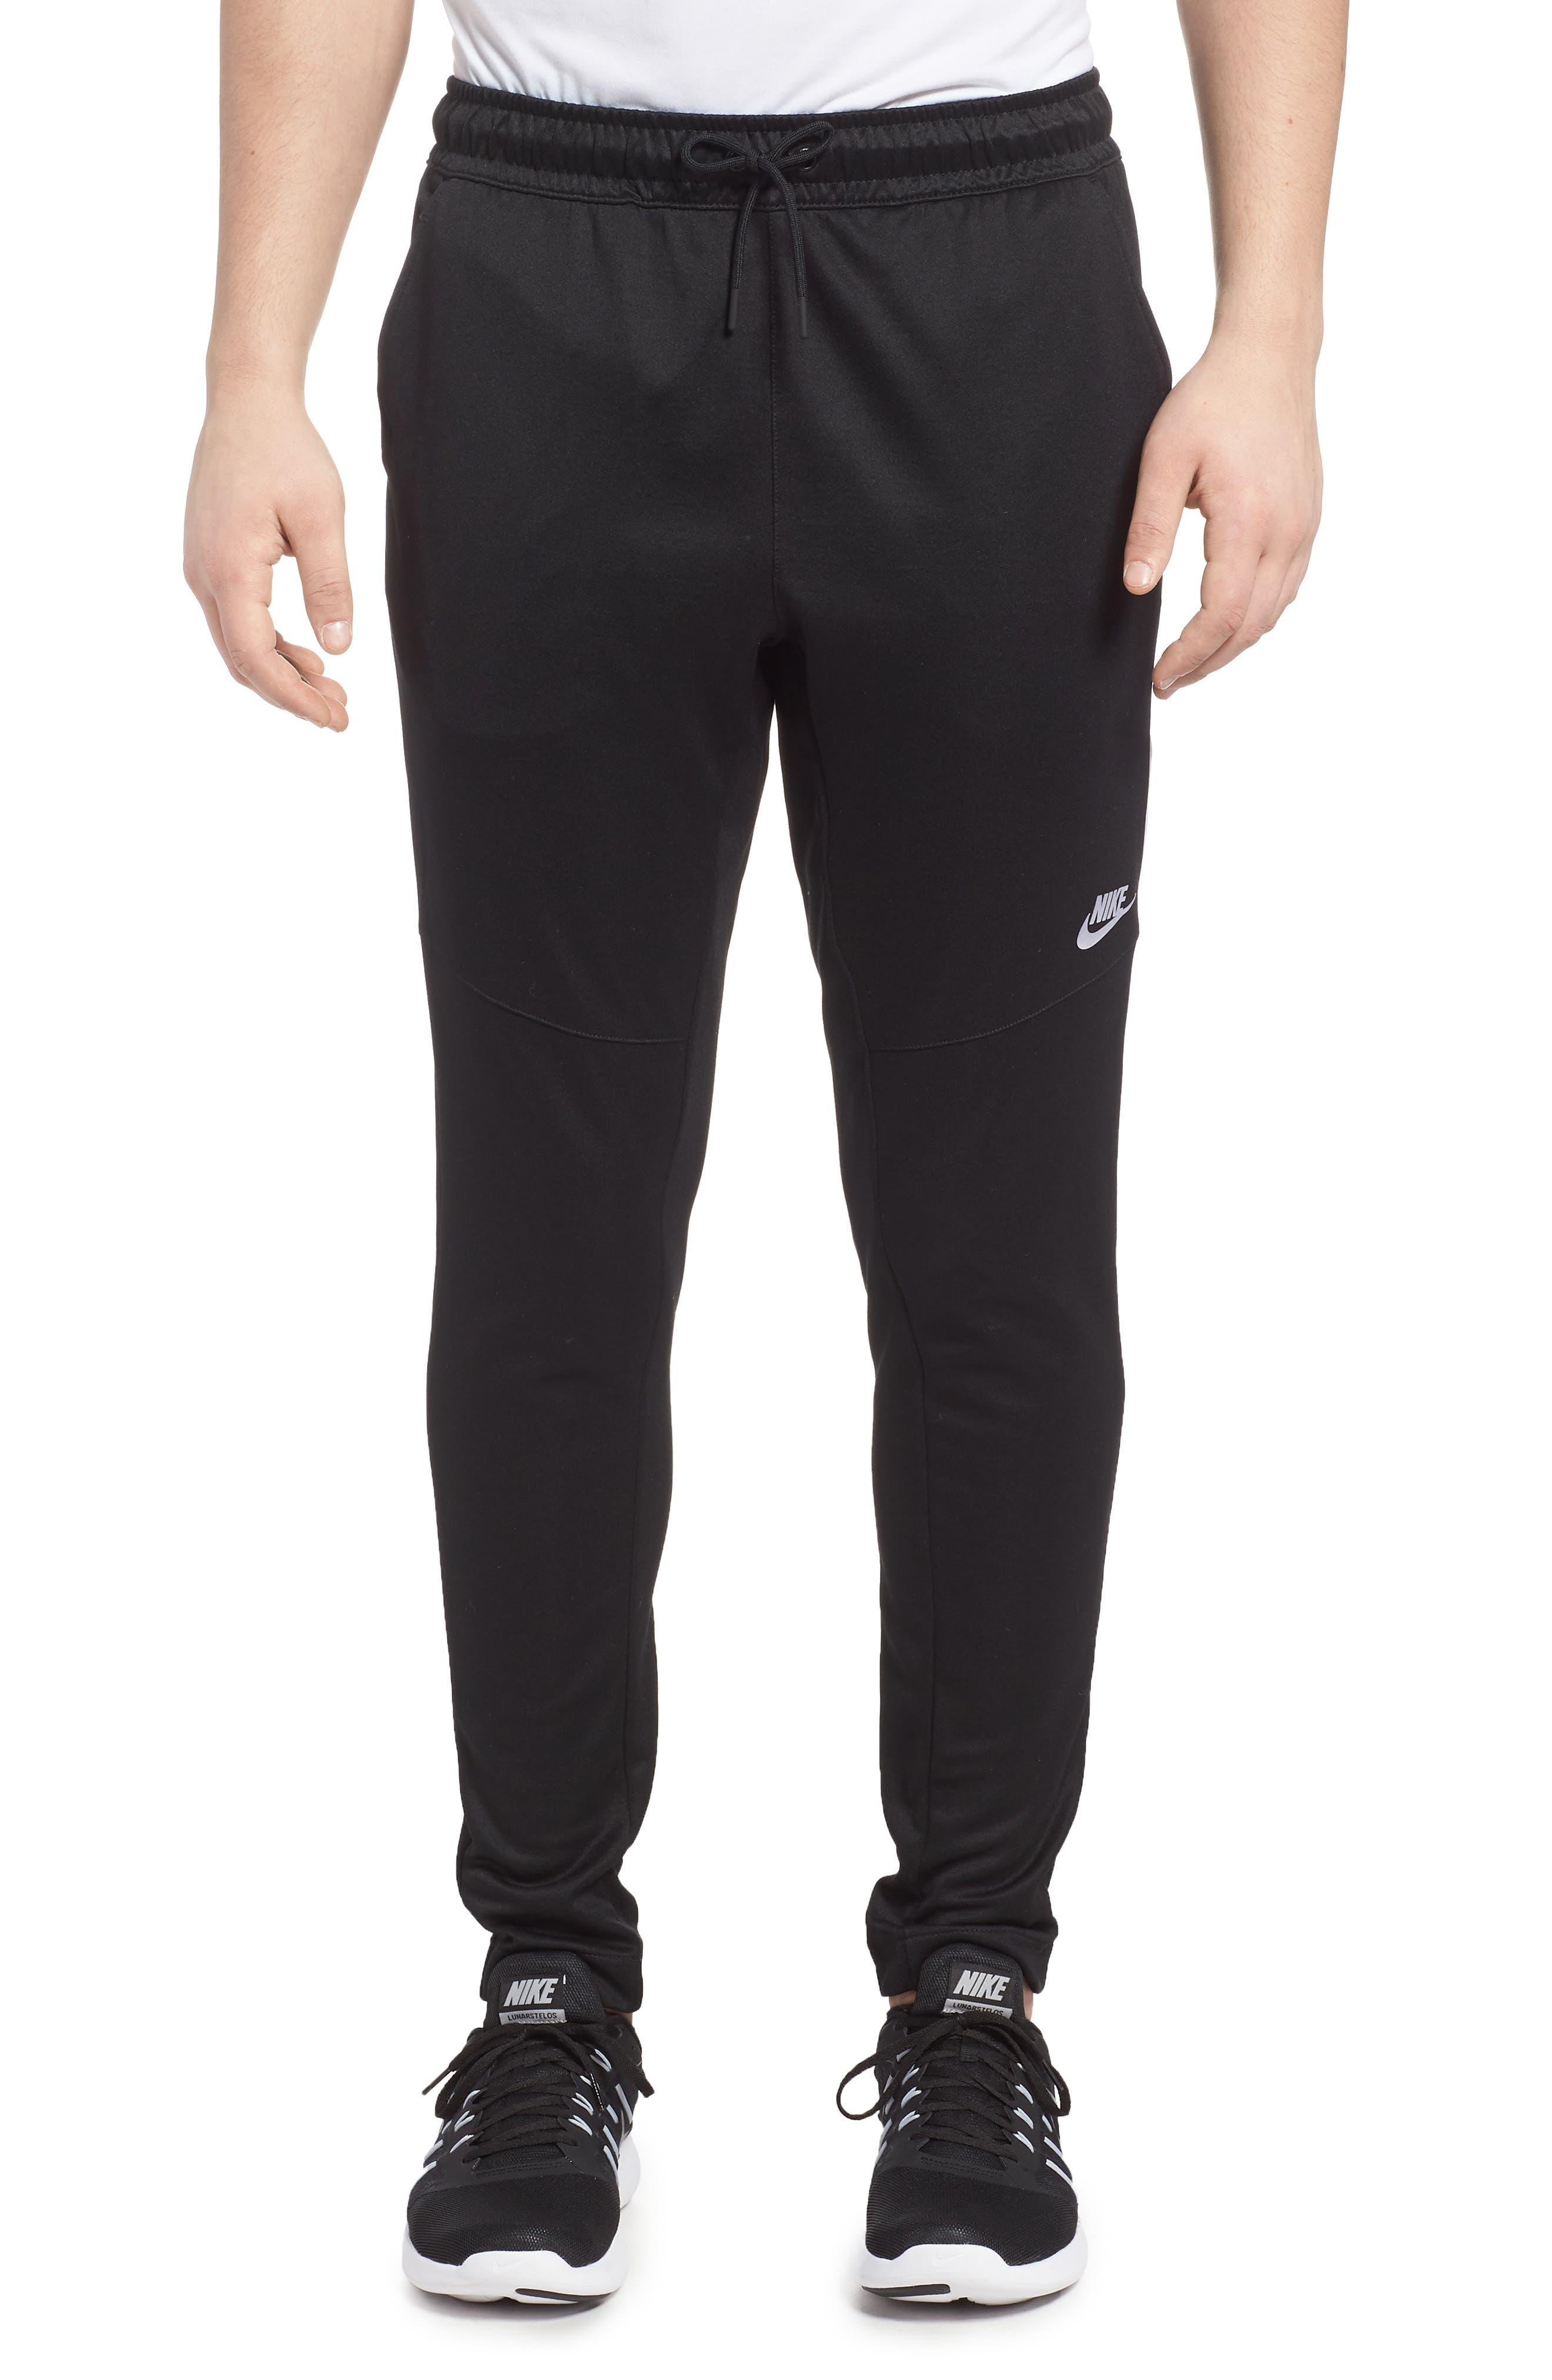 NSW Tribute Jogger Pants,                         Main,                         color, Black/ White/ White